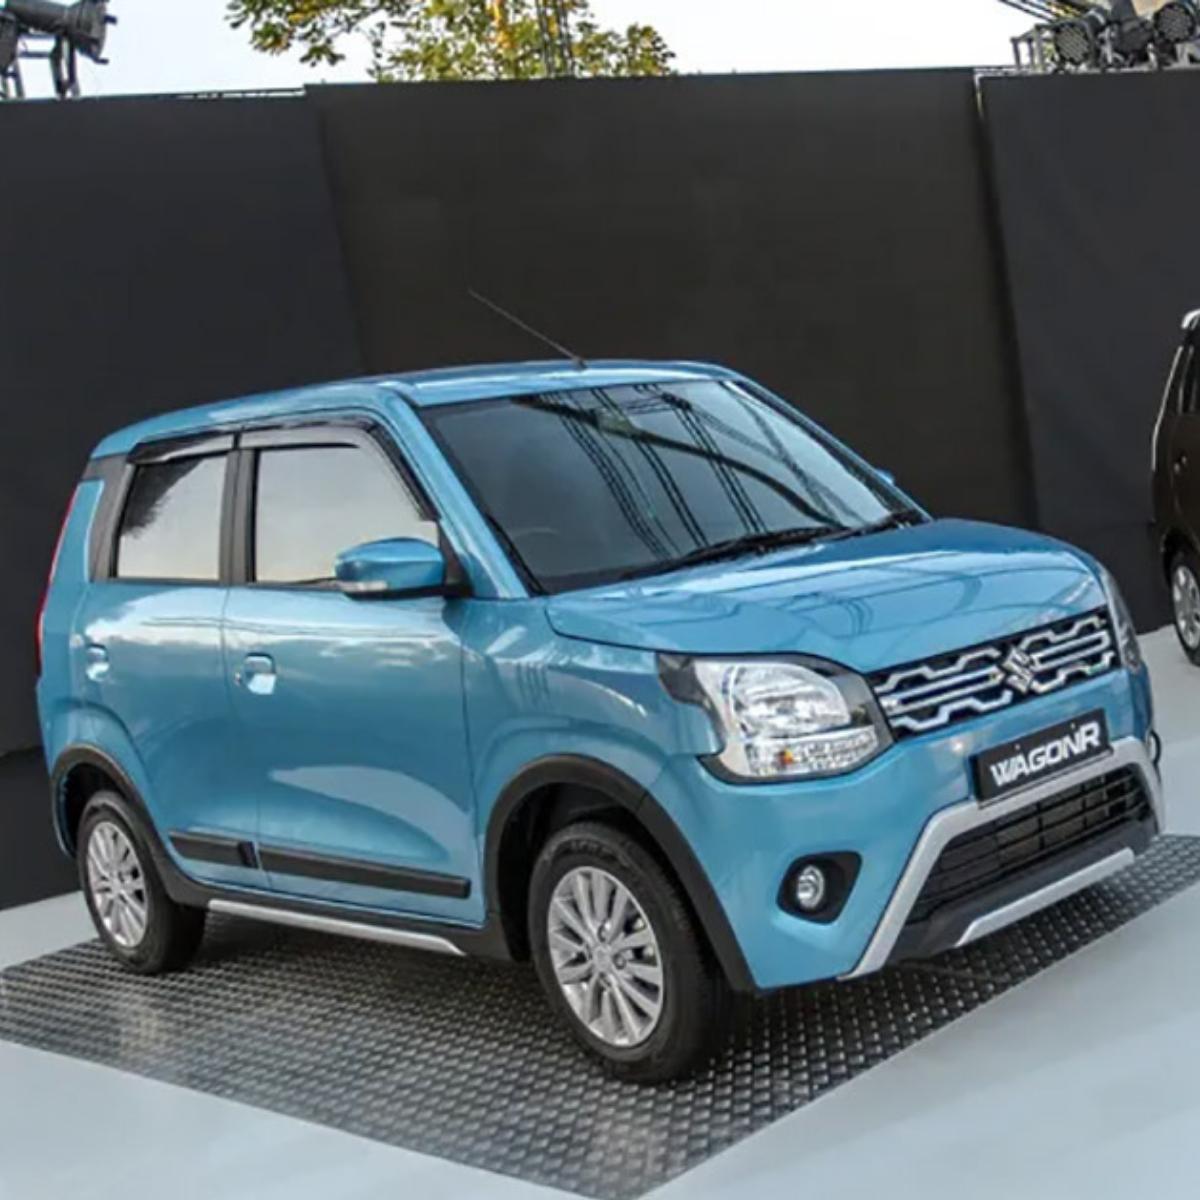 2019 Maruti Suzuki unveiled Wagon R SCNG at Rs 4.84 lakh